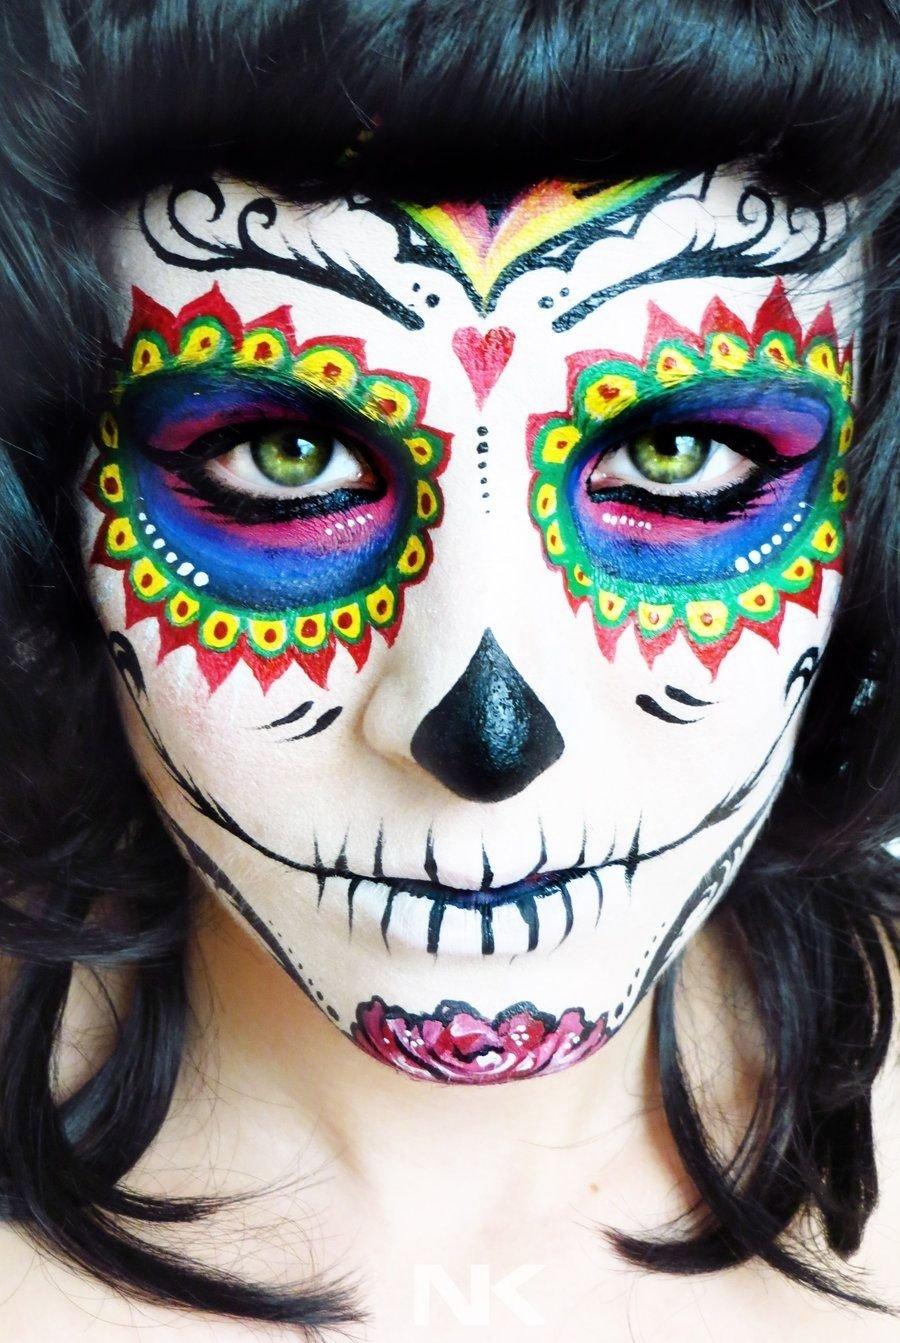 10 Best Face Painting For Halloween Ideas 41 beautiful colorful sugar skull halloween makeup ideas sugar